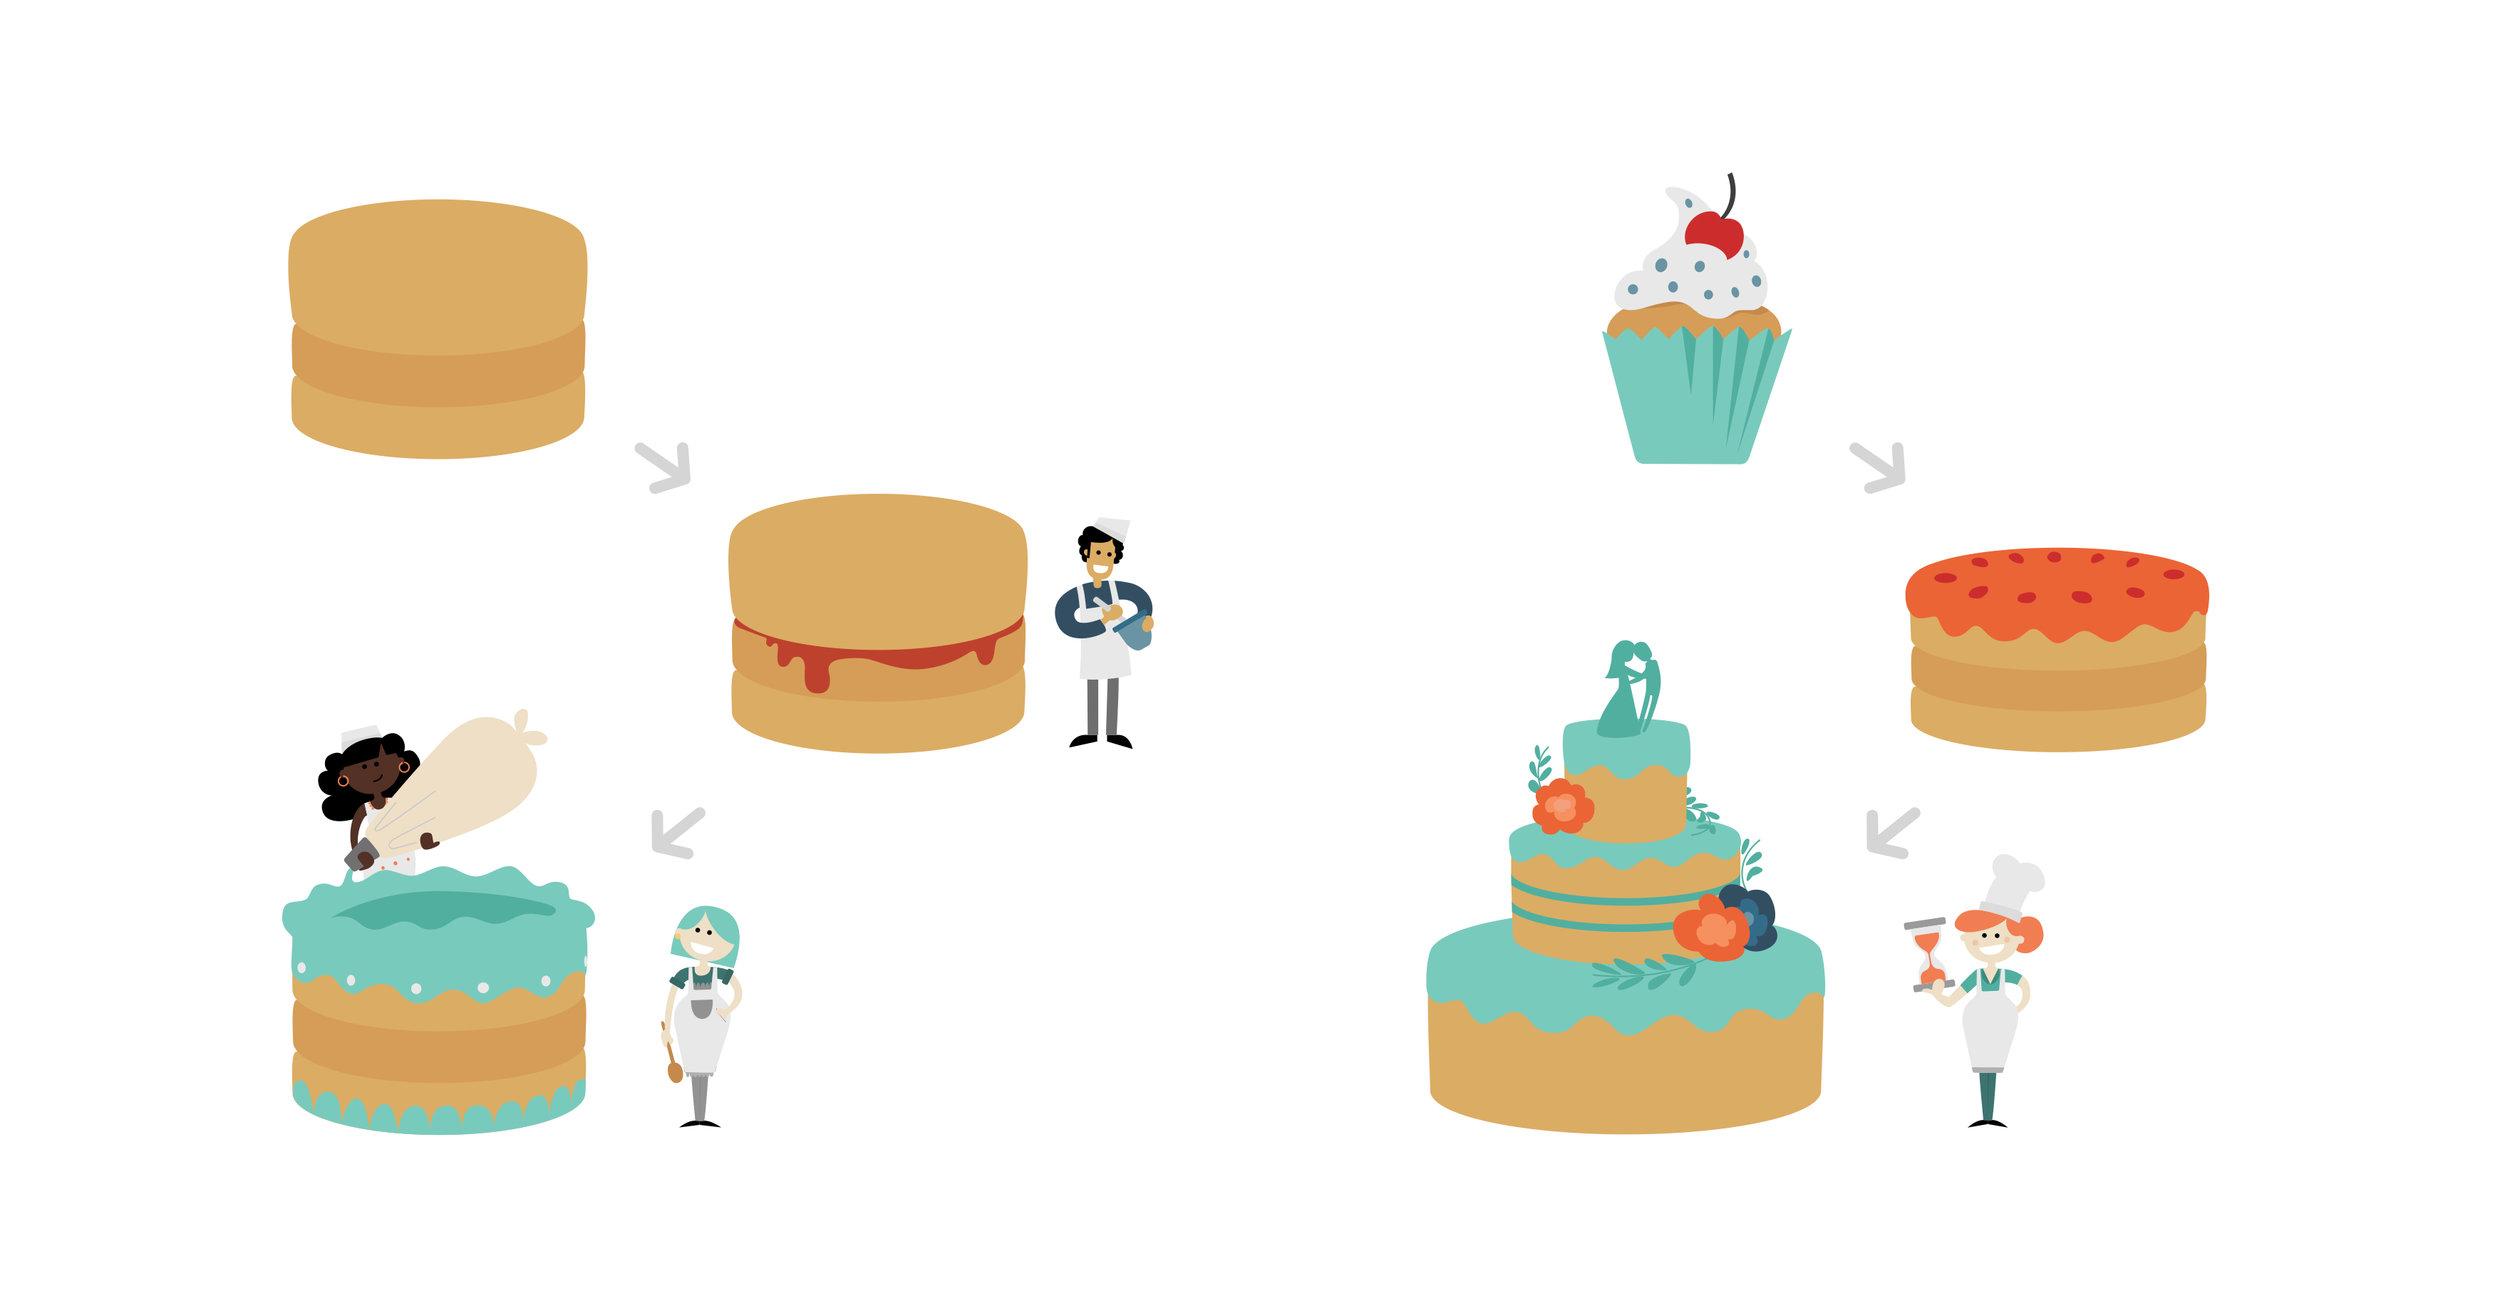 LHBS_Agile_Sprint_Guide_Illustration_13.jpg